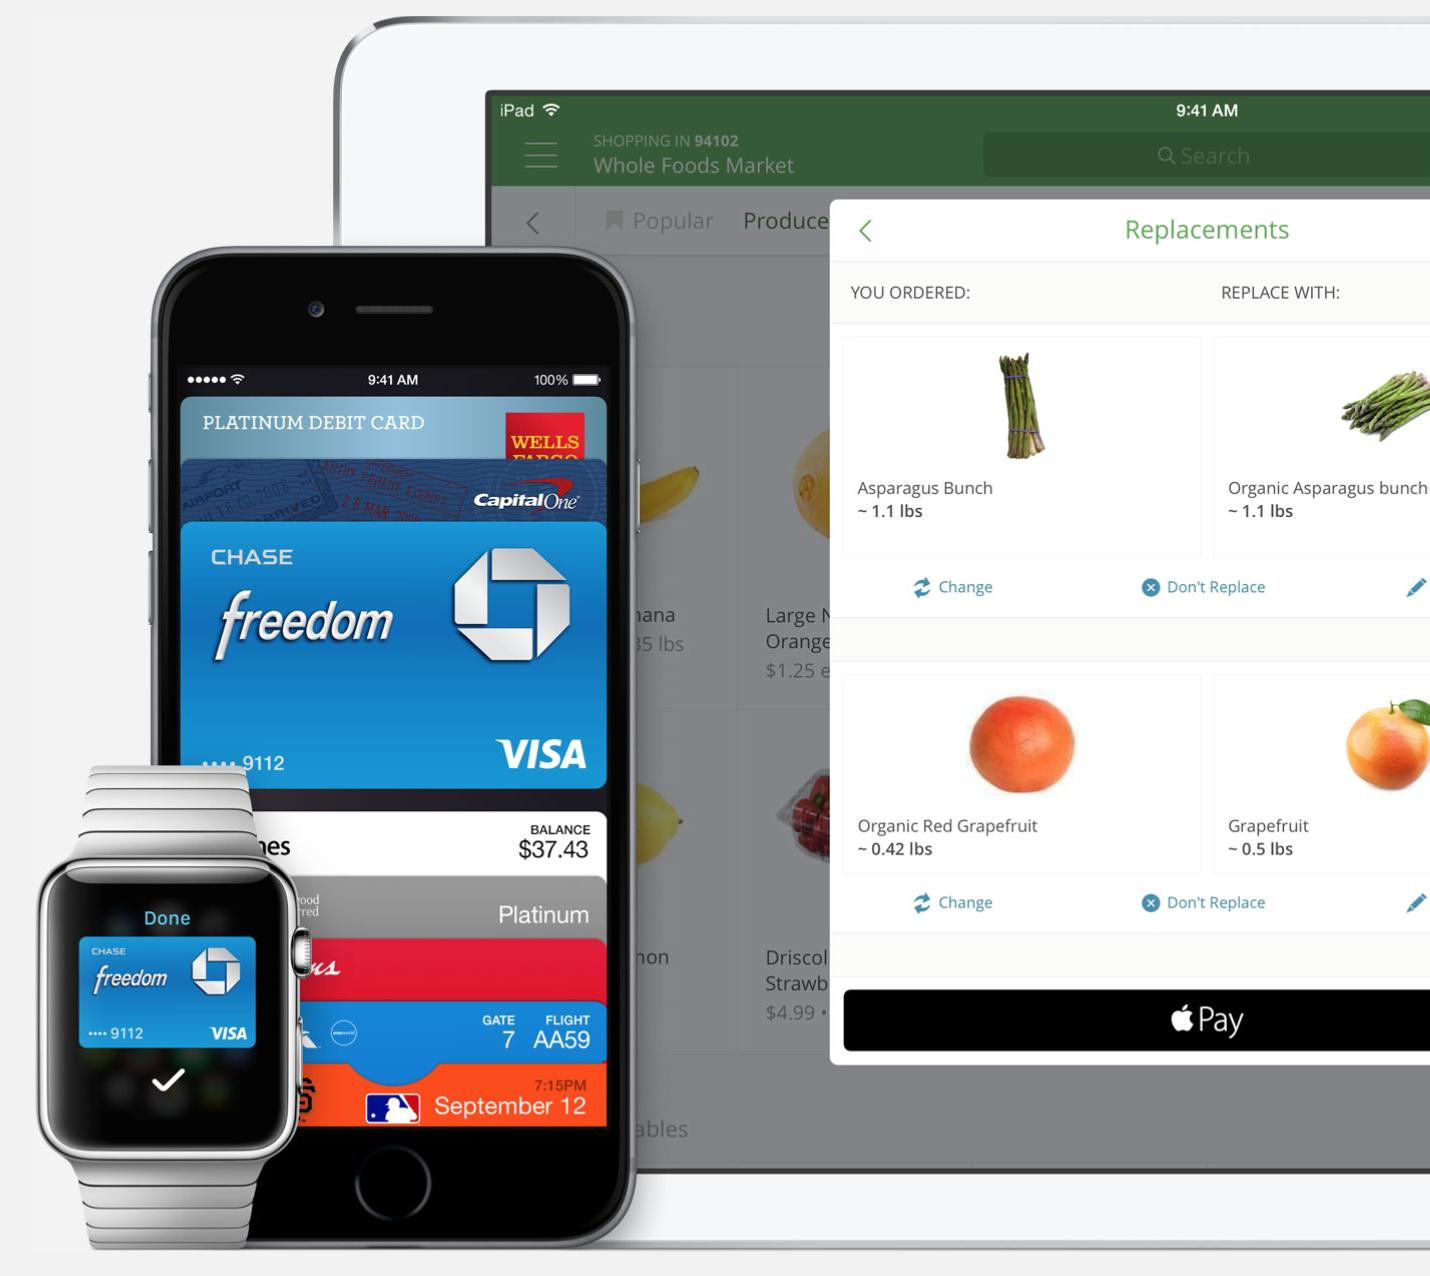 Apple Pay Watch iPhone iPad